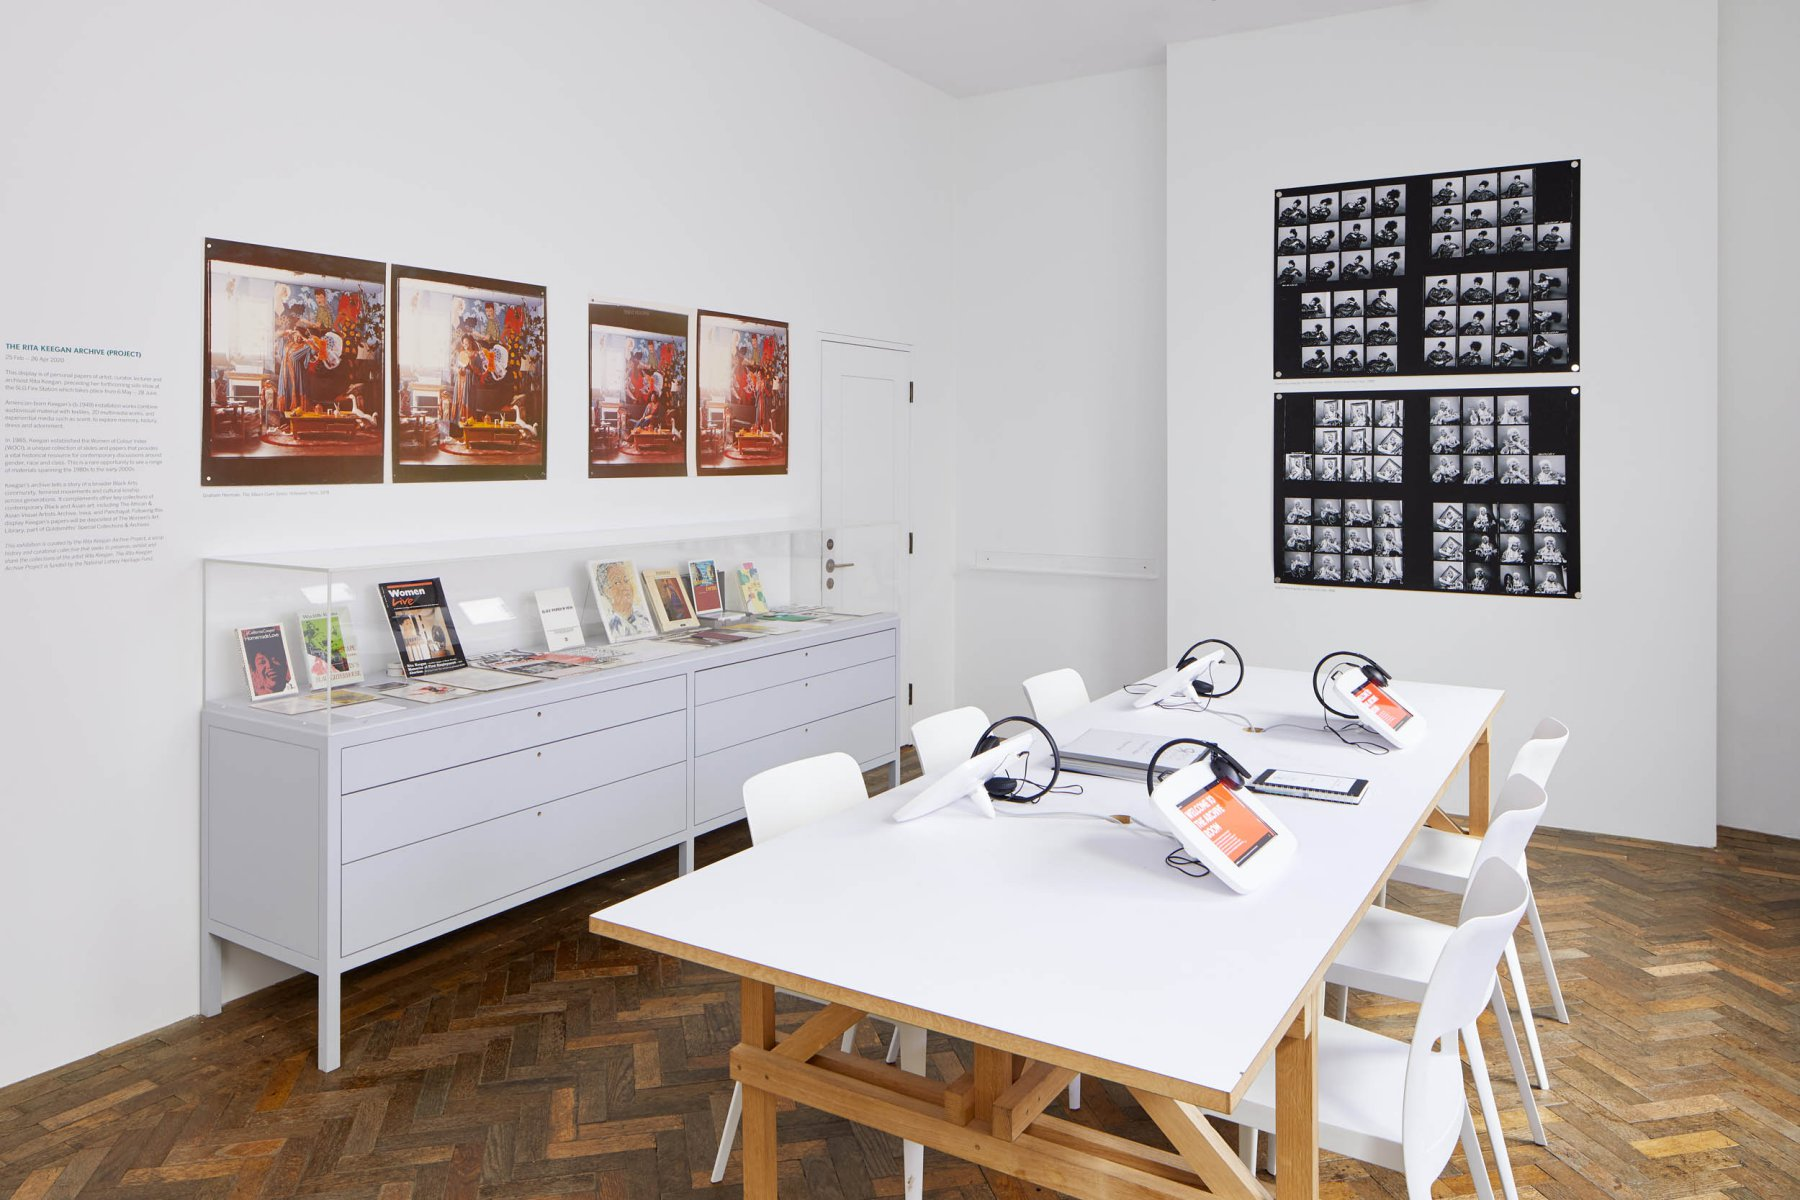 South London Gallery Rita Keegan Archive